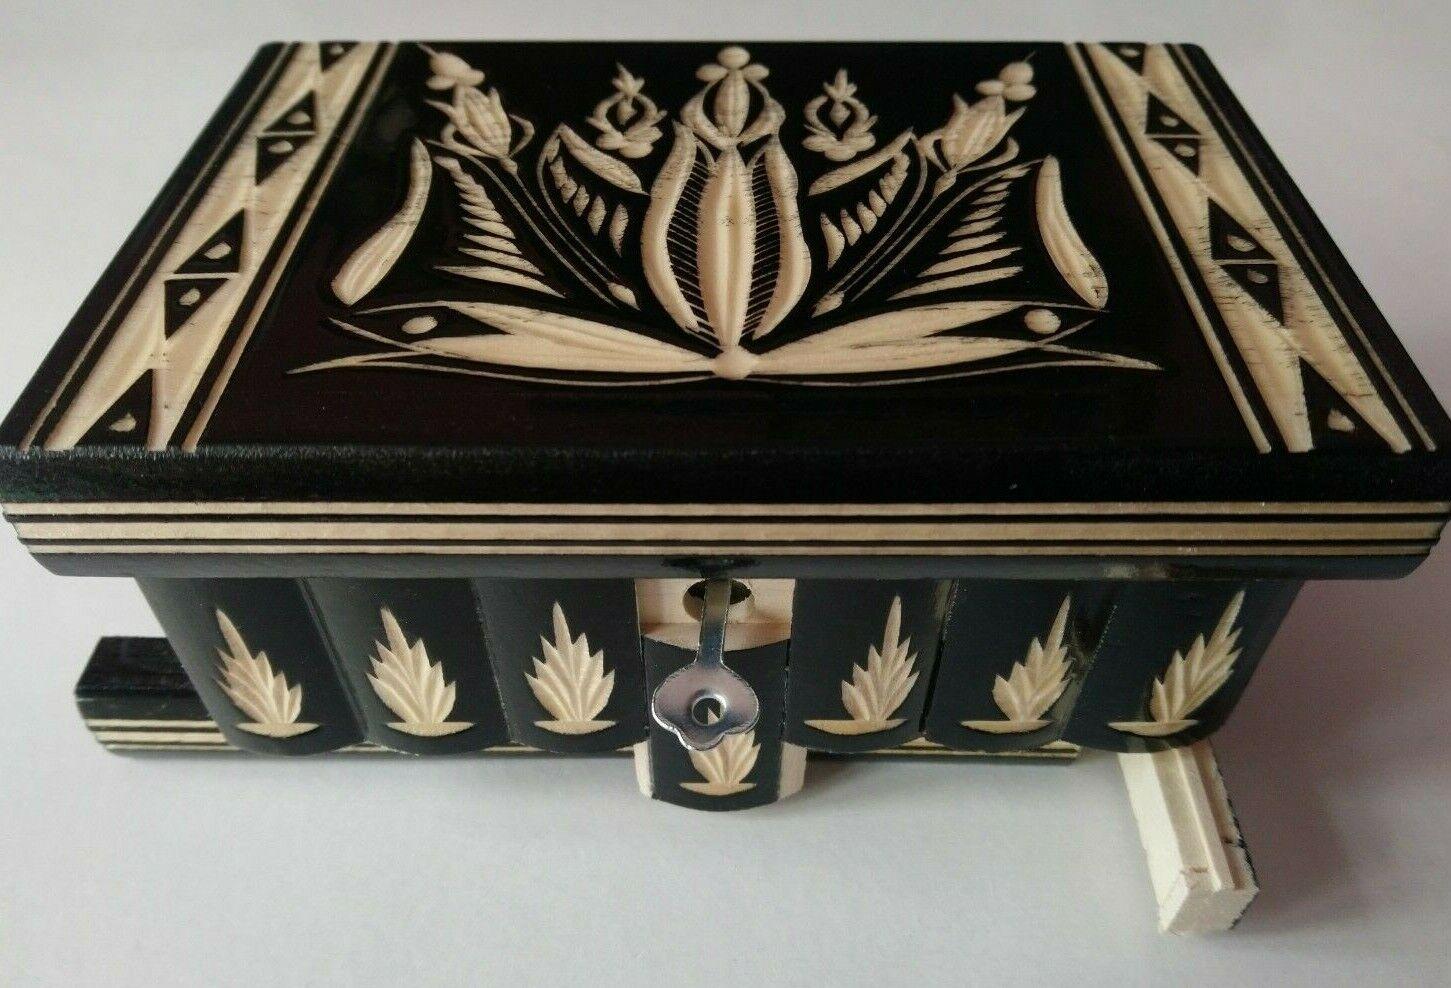 schwarz jewelry puzzle magic box brain teaser with hidden key storage treasure